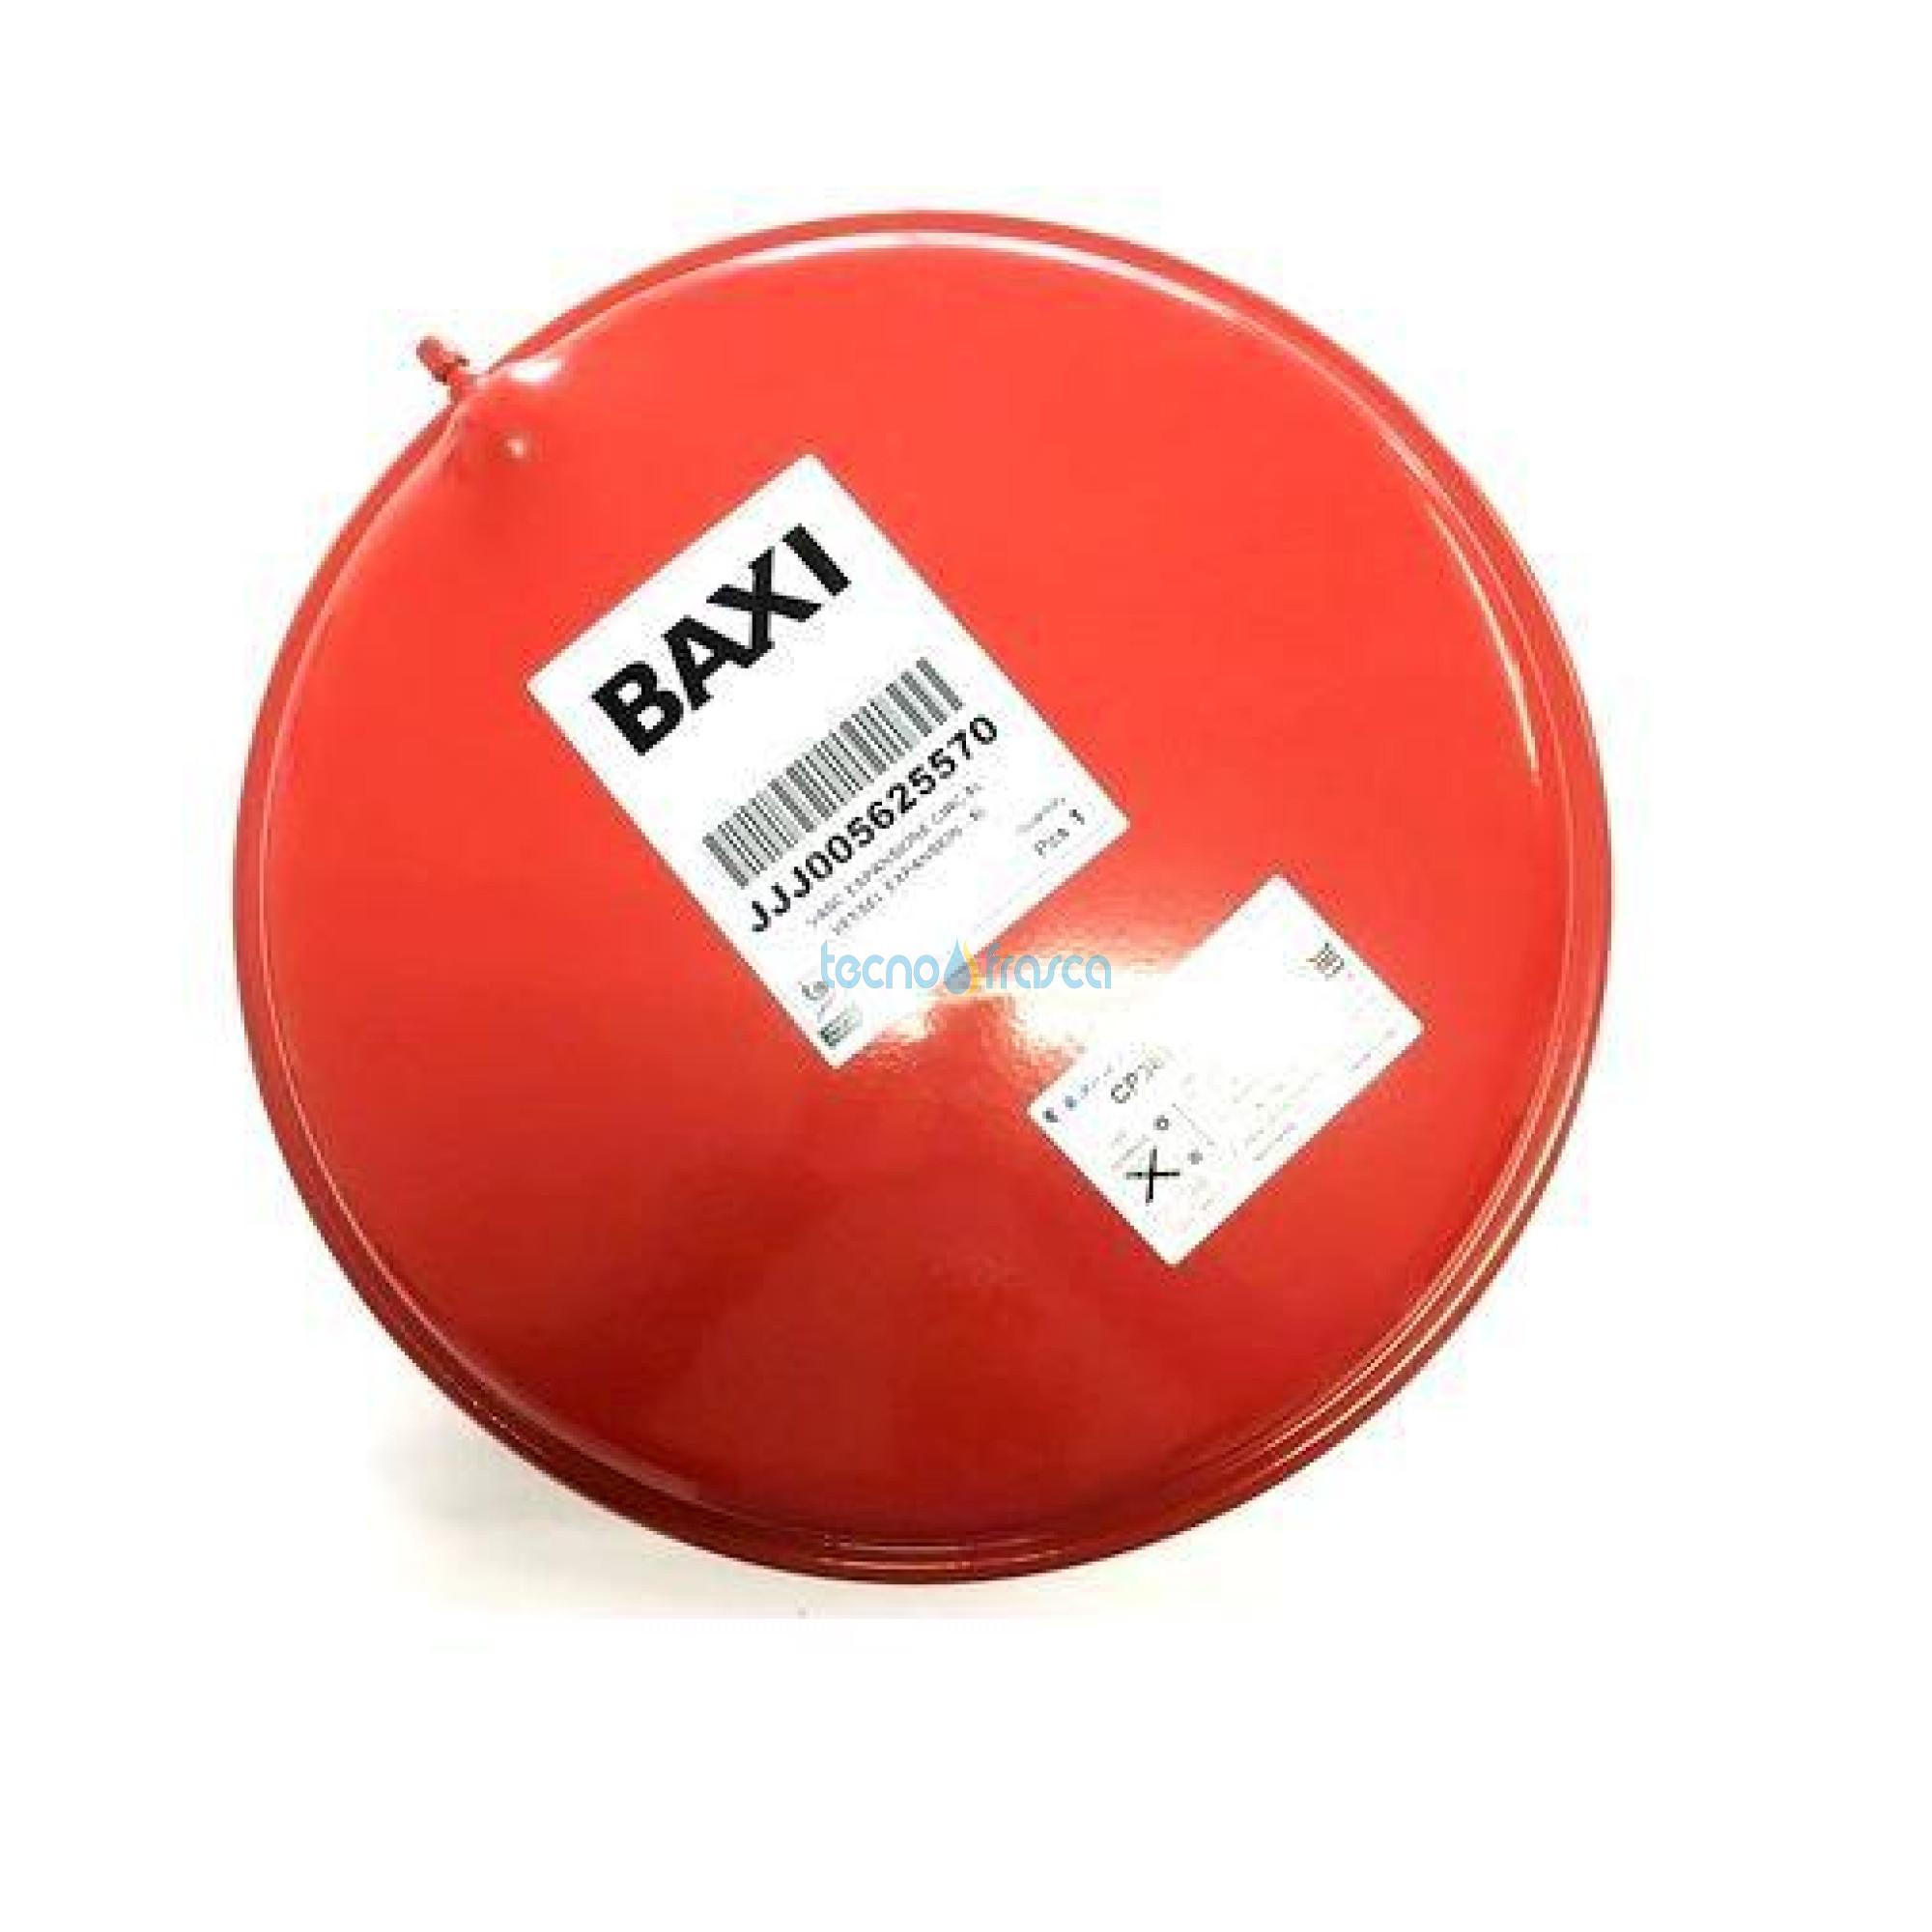 Baxi vaso espansione Caldaia ECO-3 240 I JJJ005625570